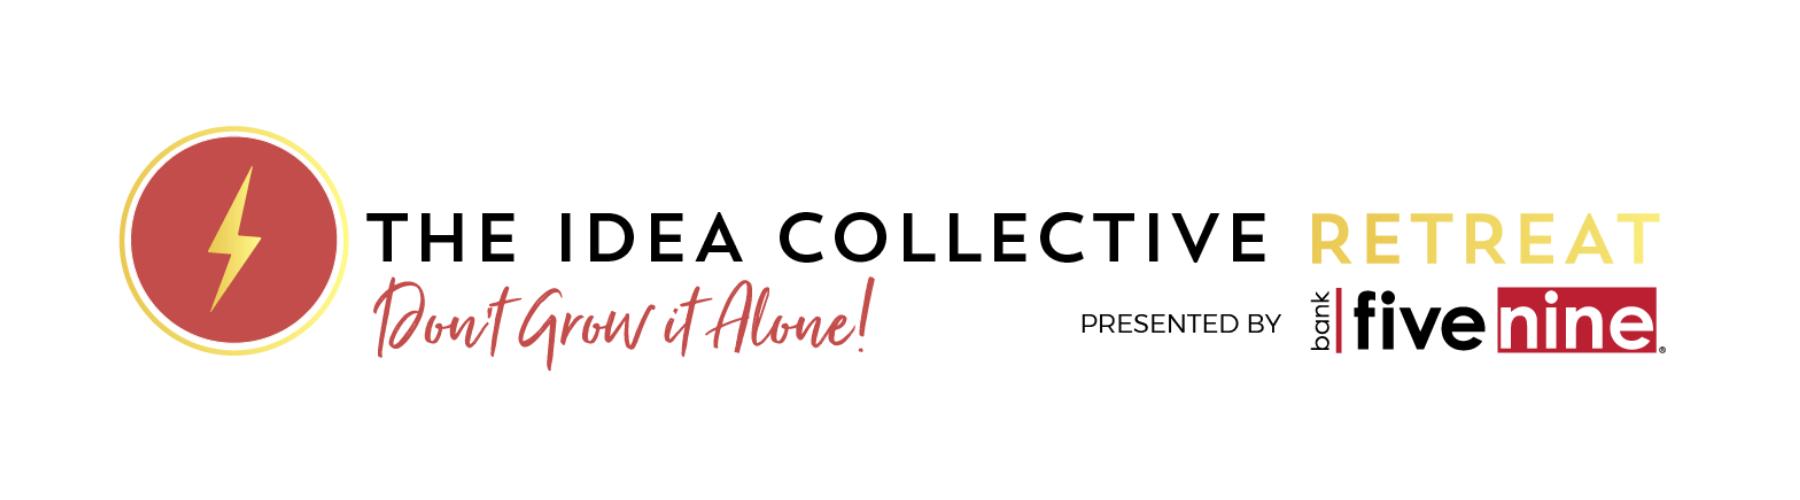 The Idea Collective Retreat Logo